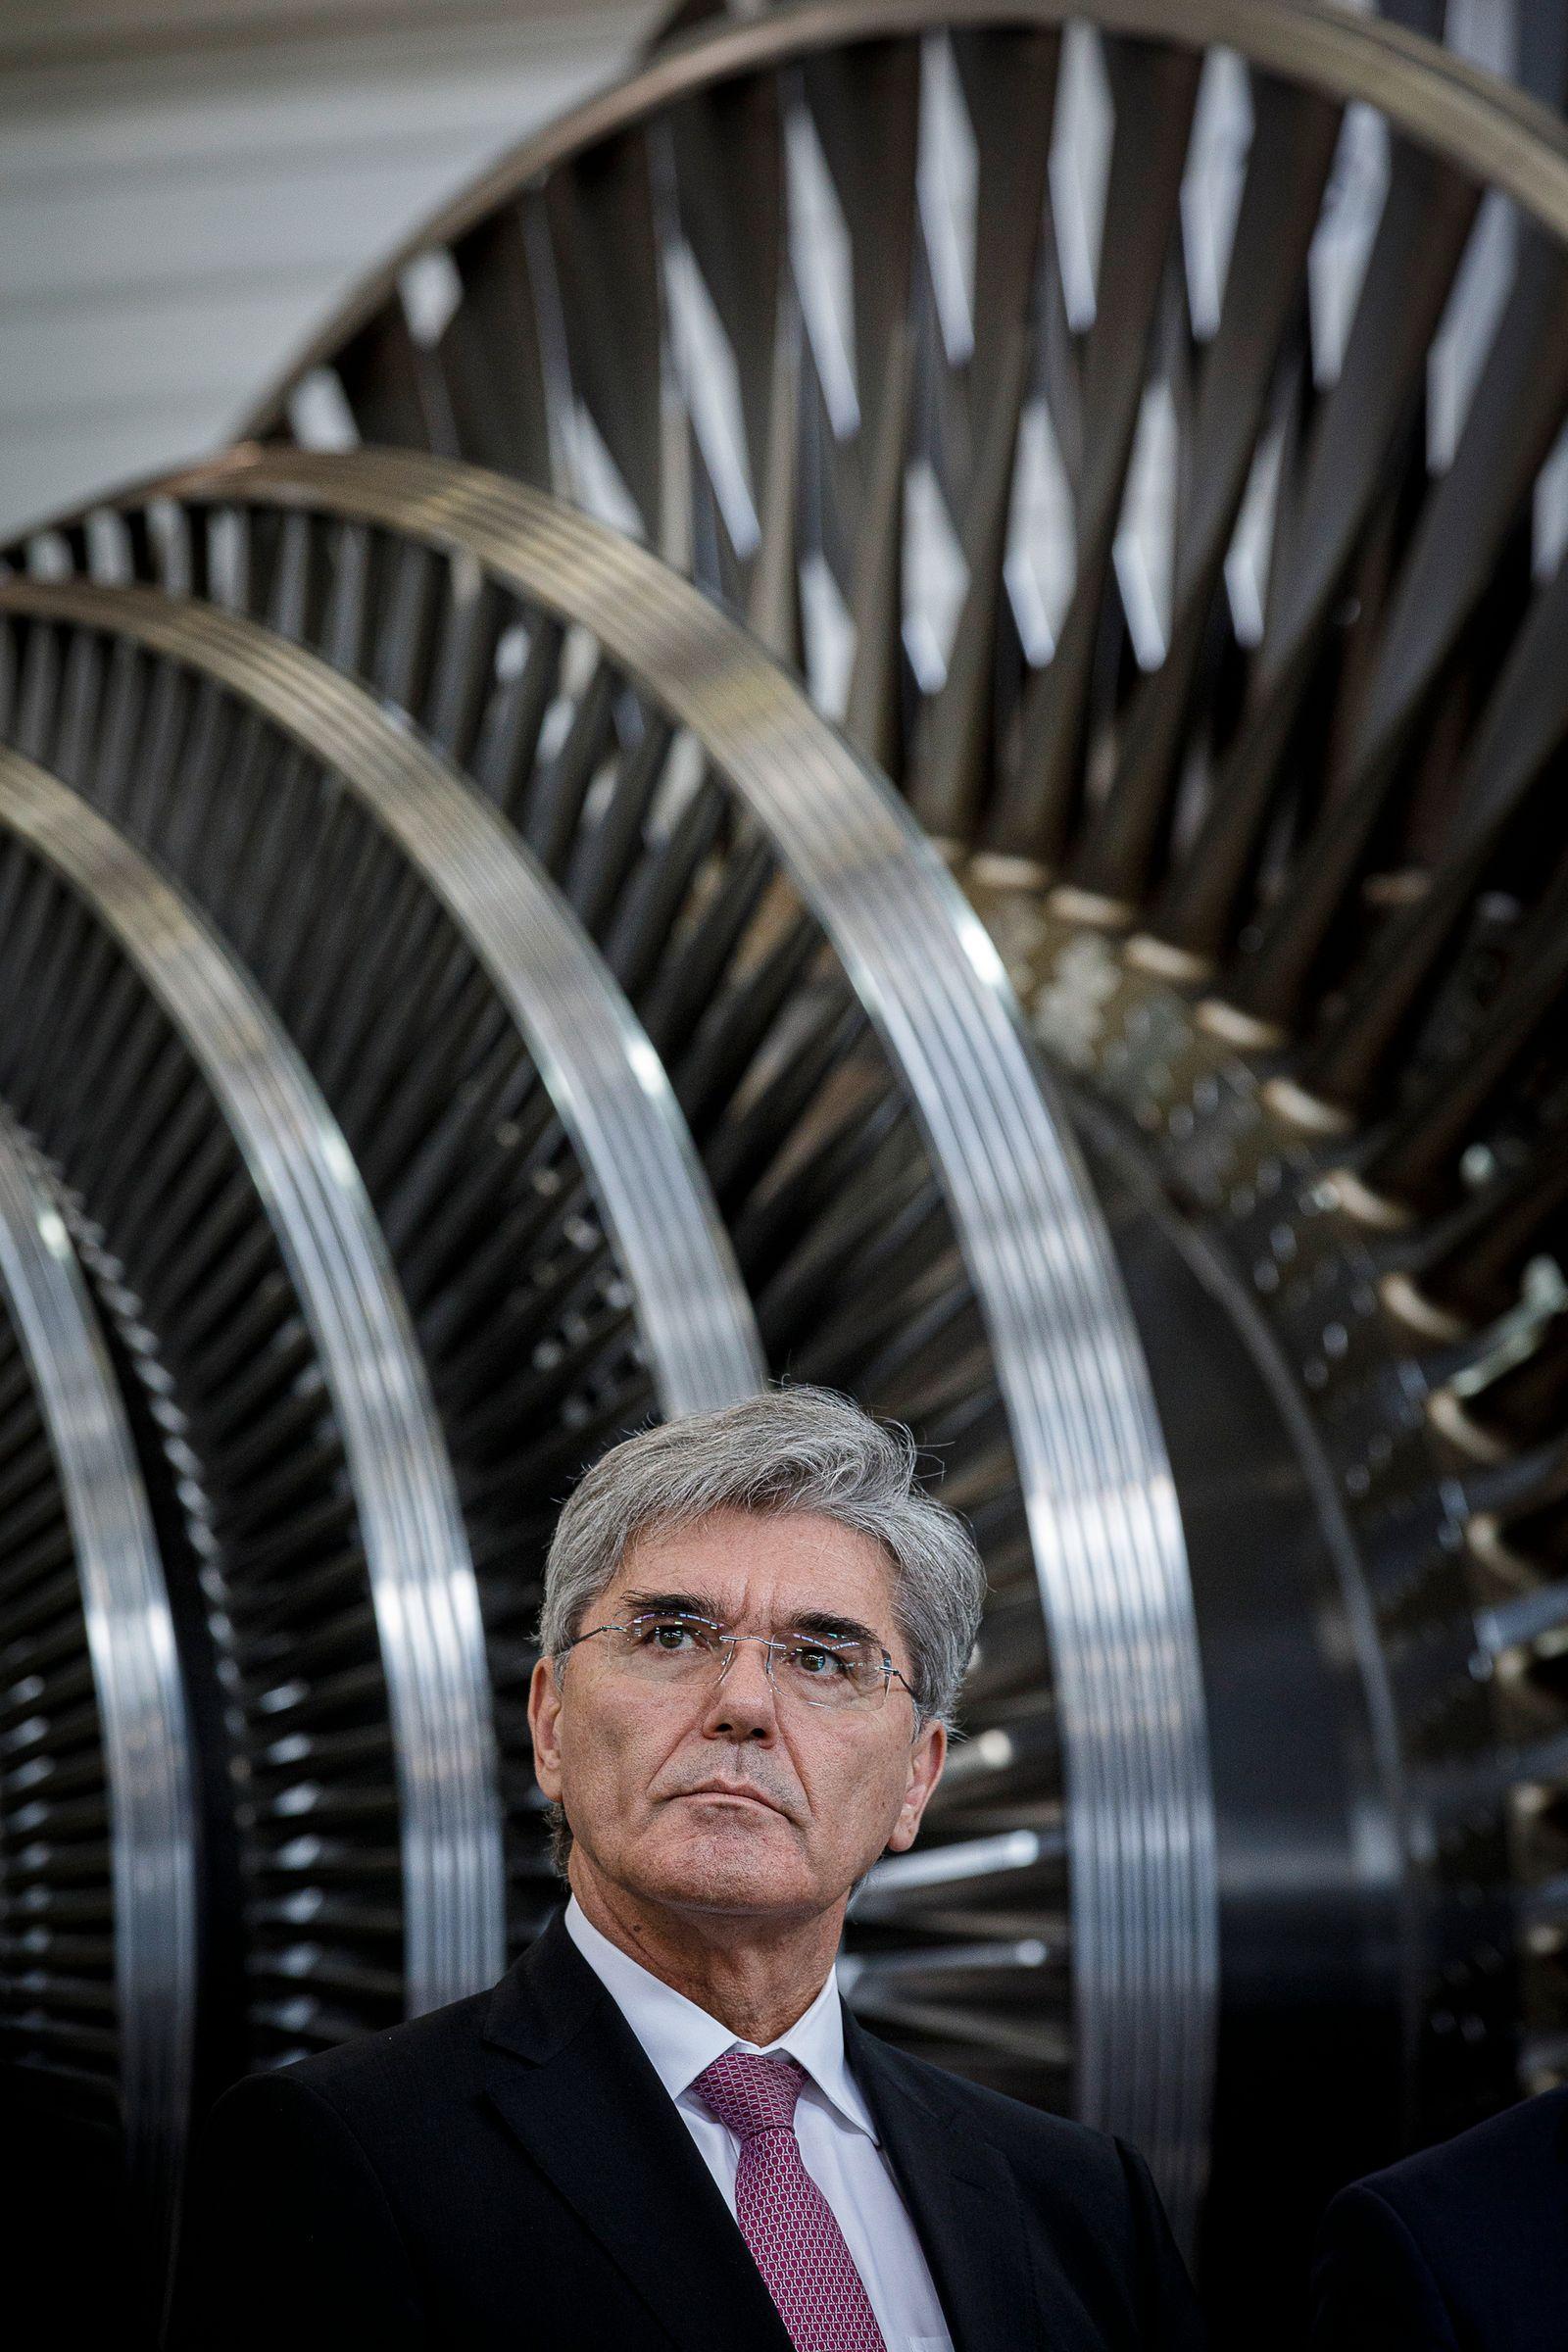 Bundeskanzlerin Merkel besucht das Siemens-Werk in Goerlitz